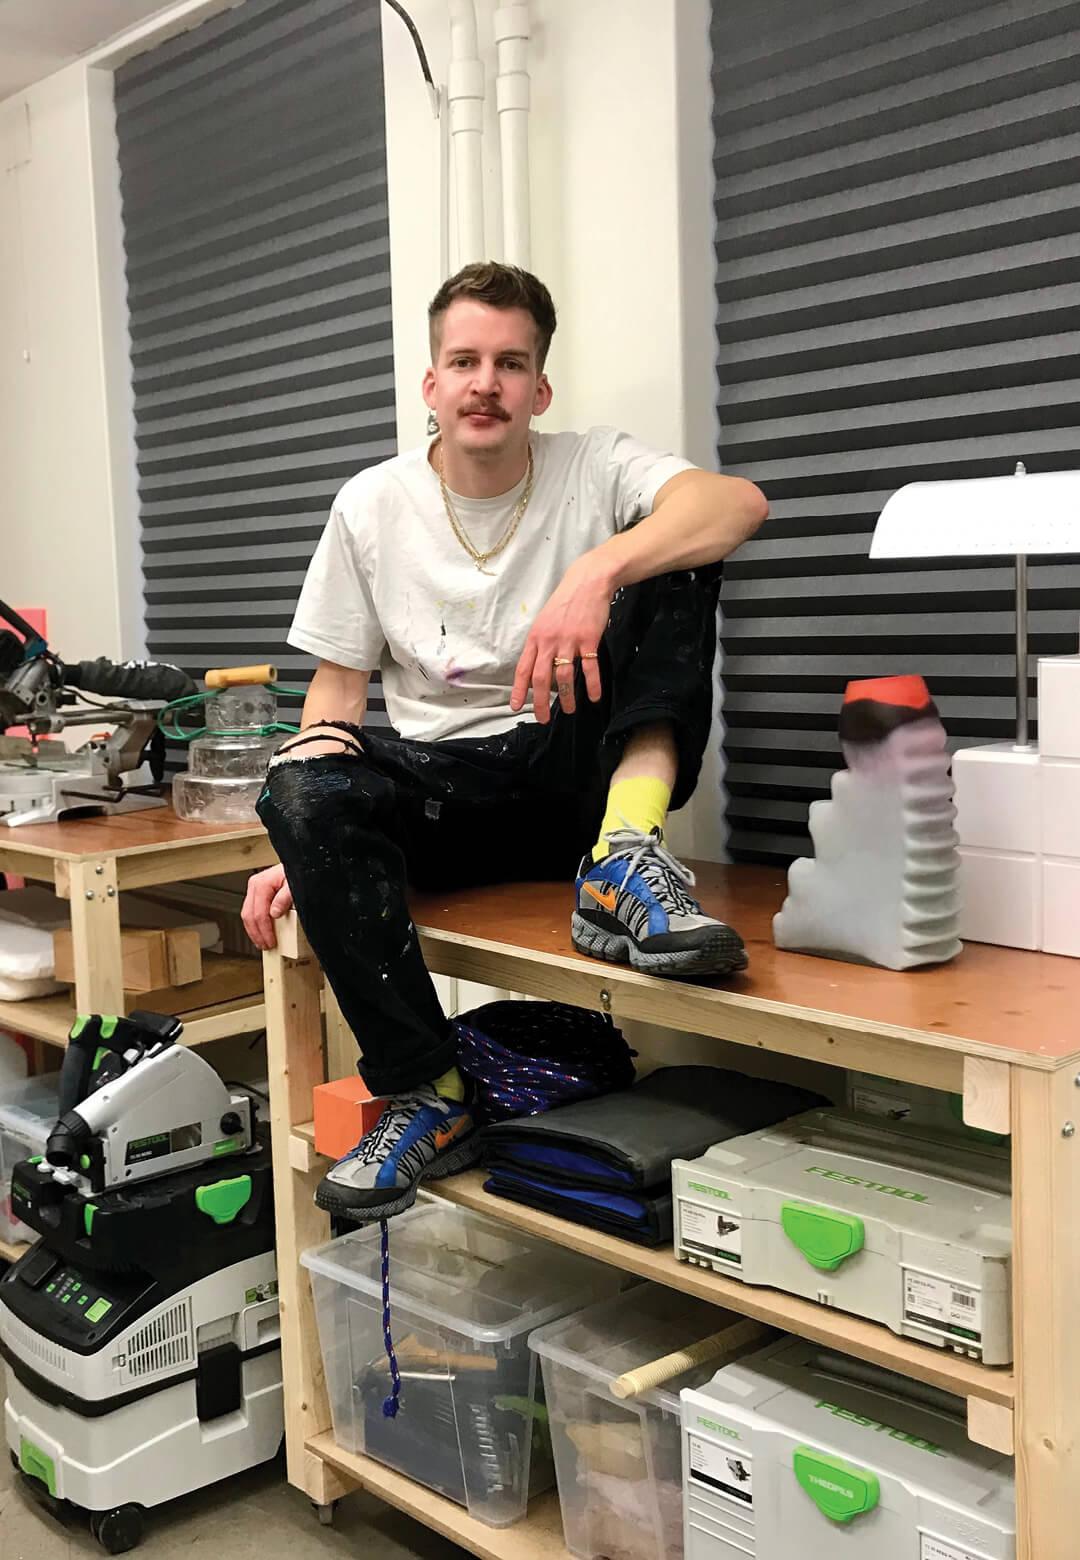 Swedish designer Jonatan Nilsson creates experimental products that challenge the status quo | Jonatan Nilsson | Jonatan Nilsson | STIRworld